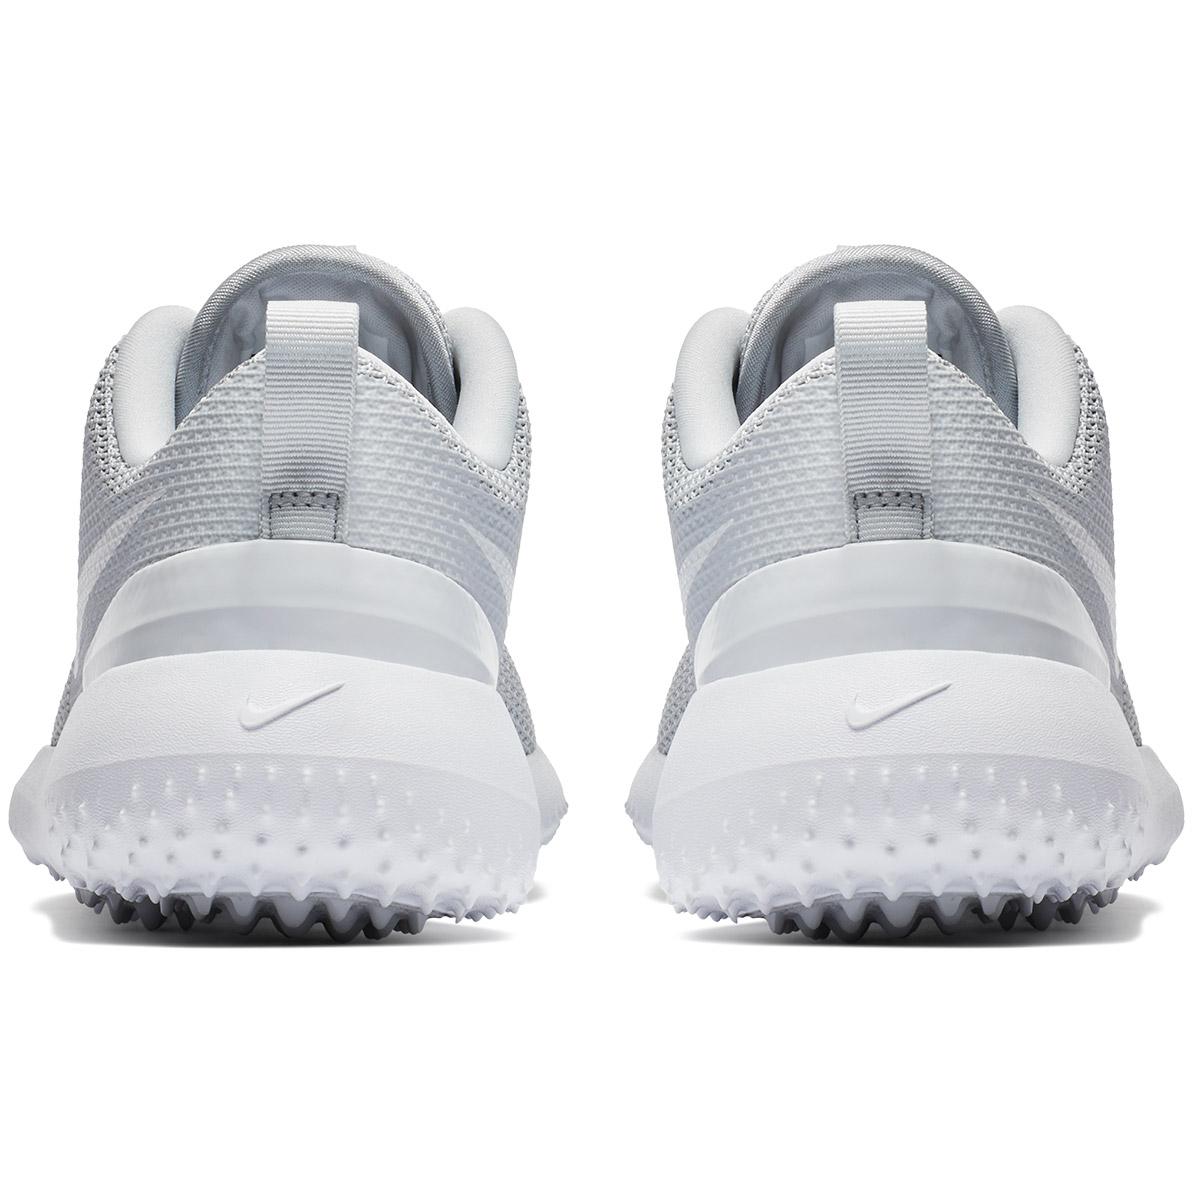 pretty nice 9b8b6 92434 Nike Golf Roshe G Ladies Shoes. Nike Roshe G S9 ...